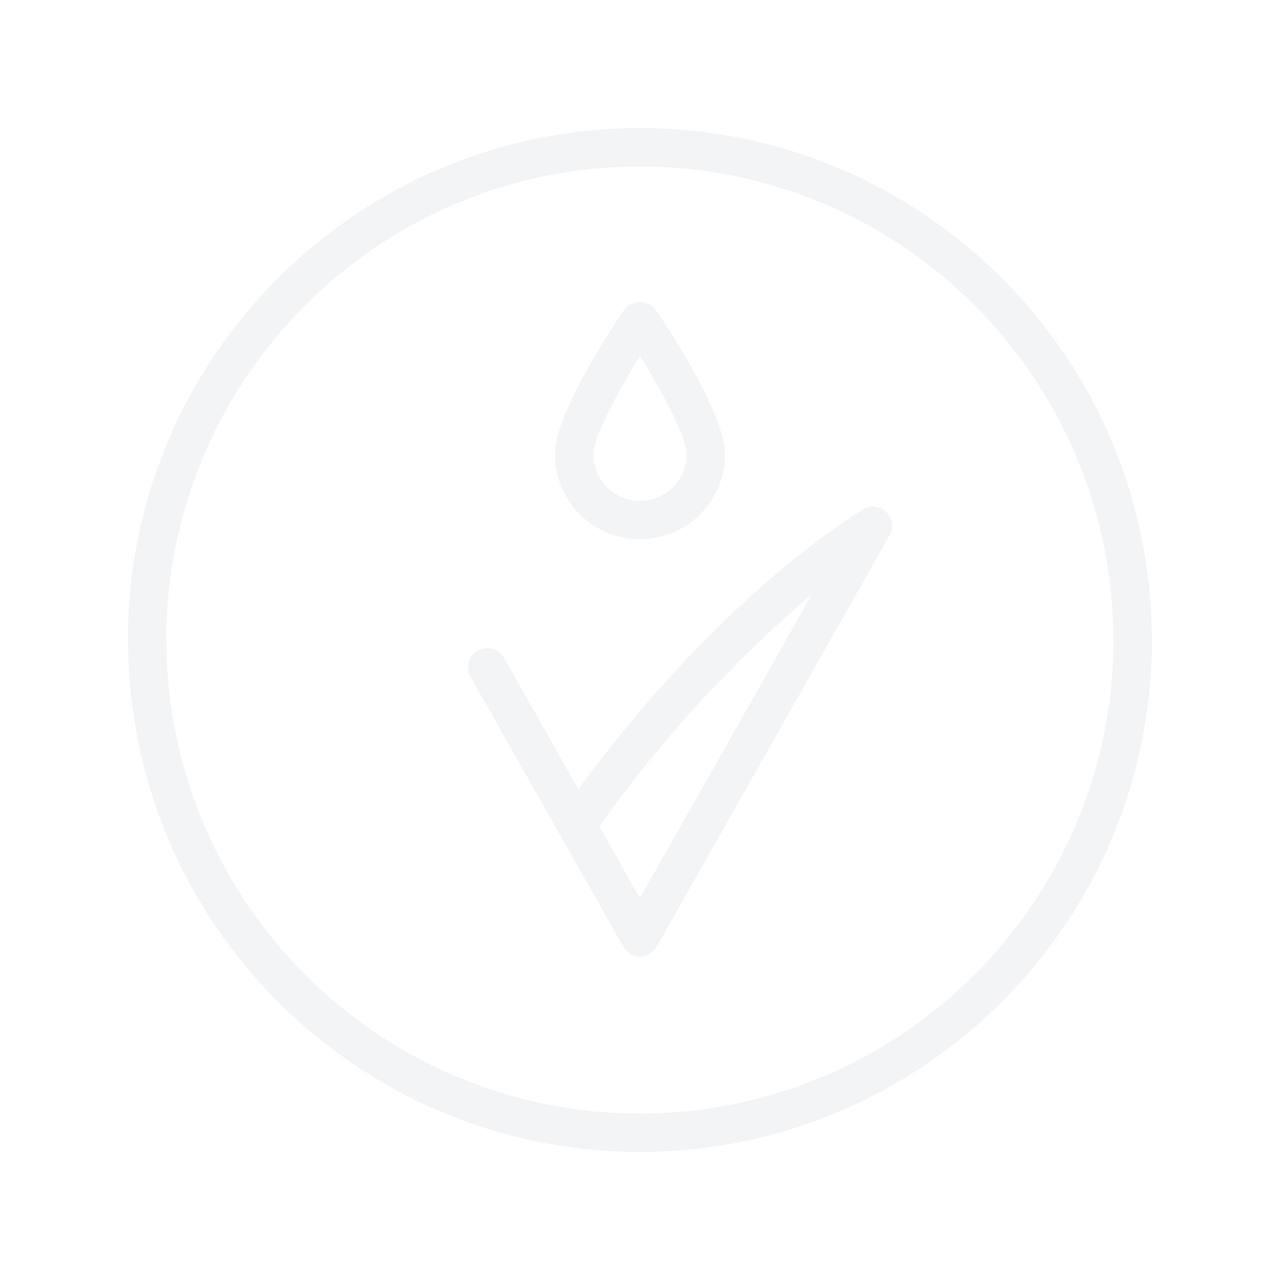 TRUSSARDI Riflesso Deodorant Stick 75ml